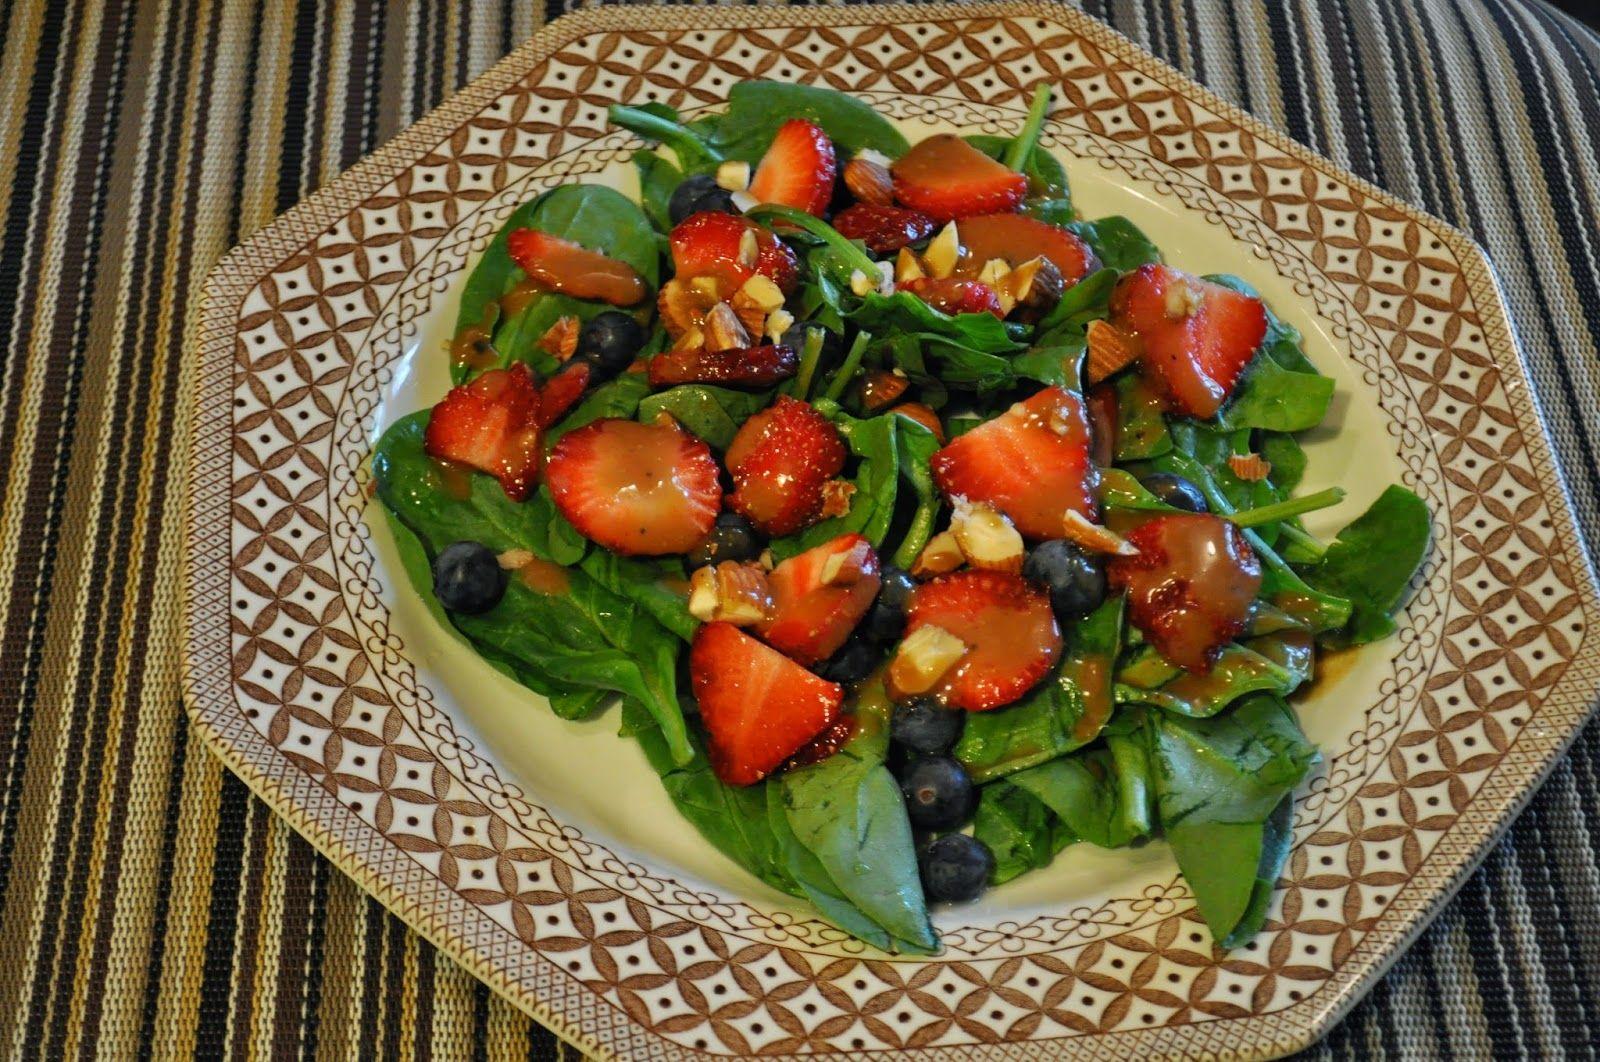 Very Berry Salad with Dijon Balsamic Vinaigrette